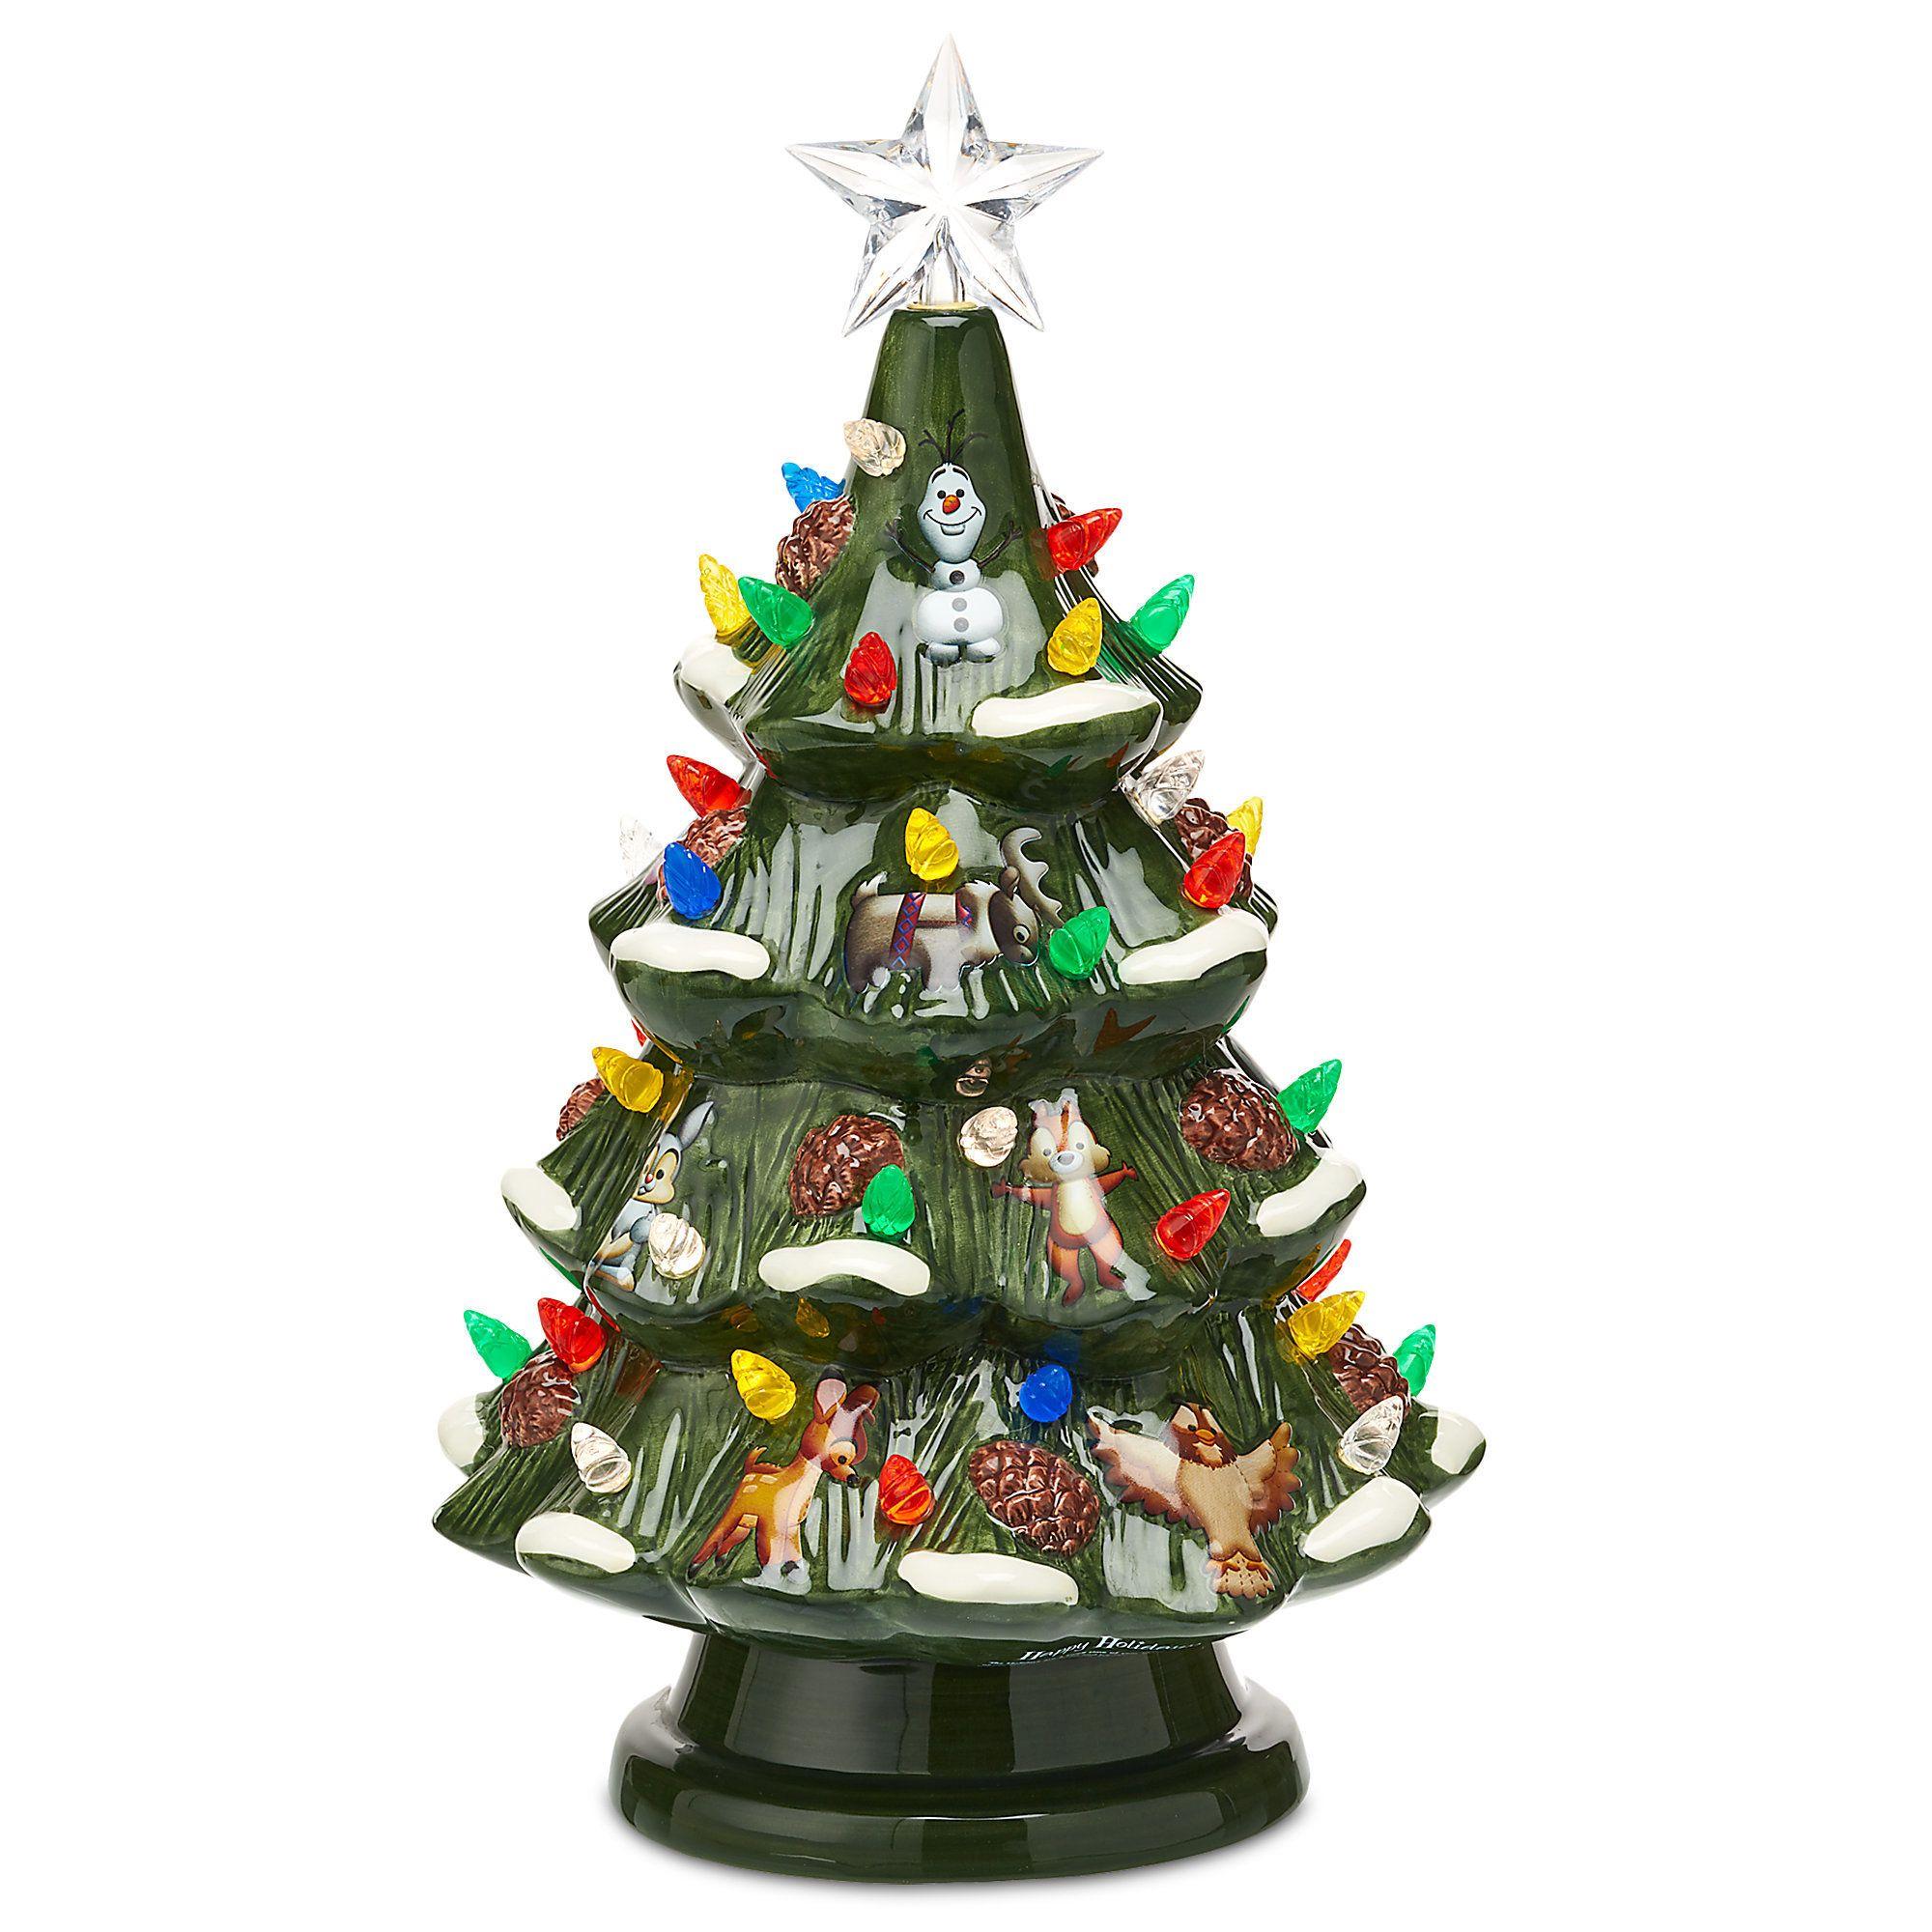 Disney Retro Ceramic Light Up Tree Animated Christmas Decorations Decorating With Christmas Lights Disney Christmas Decorations Outdoor